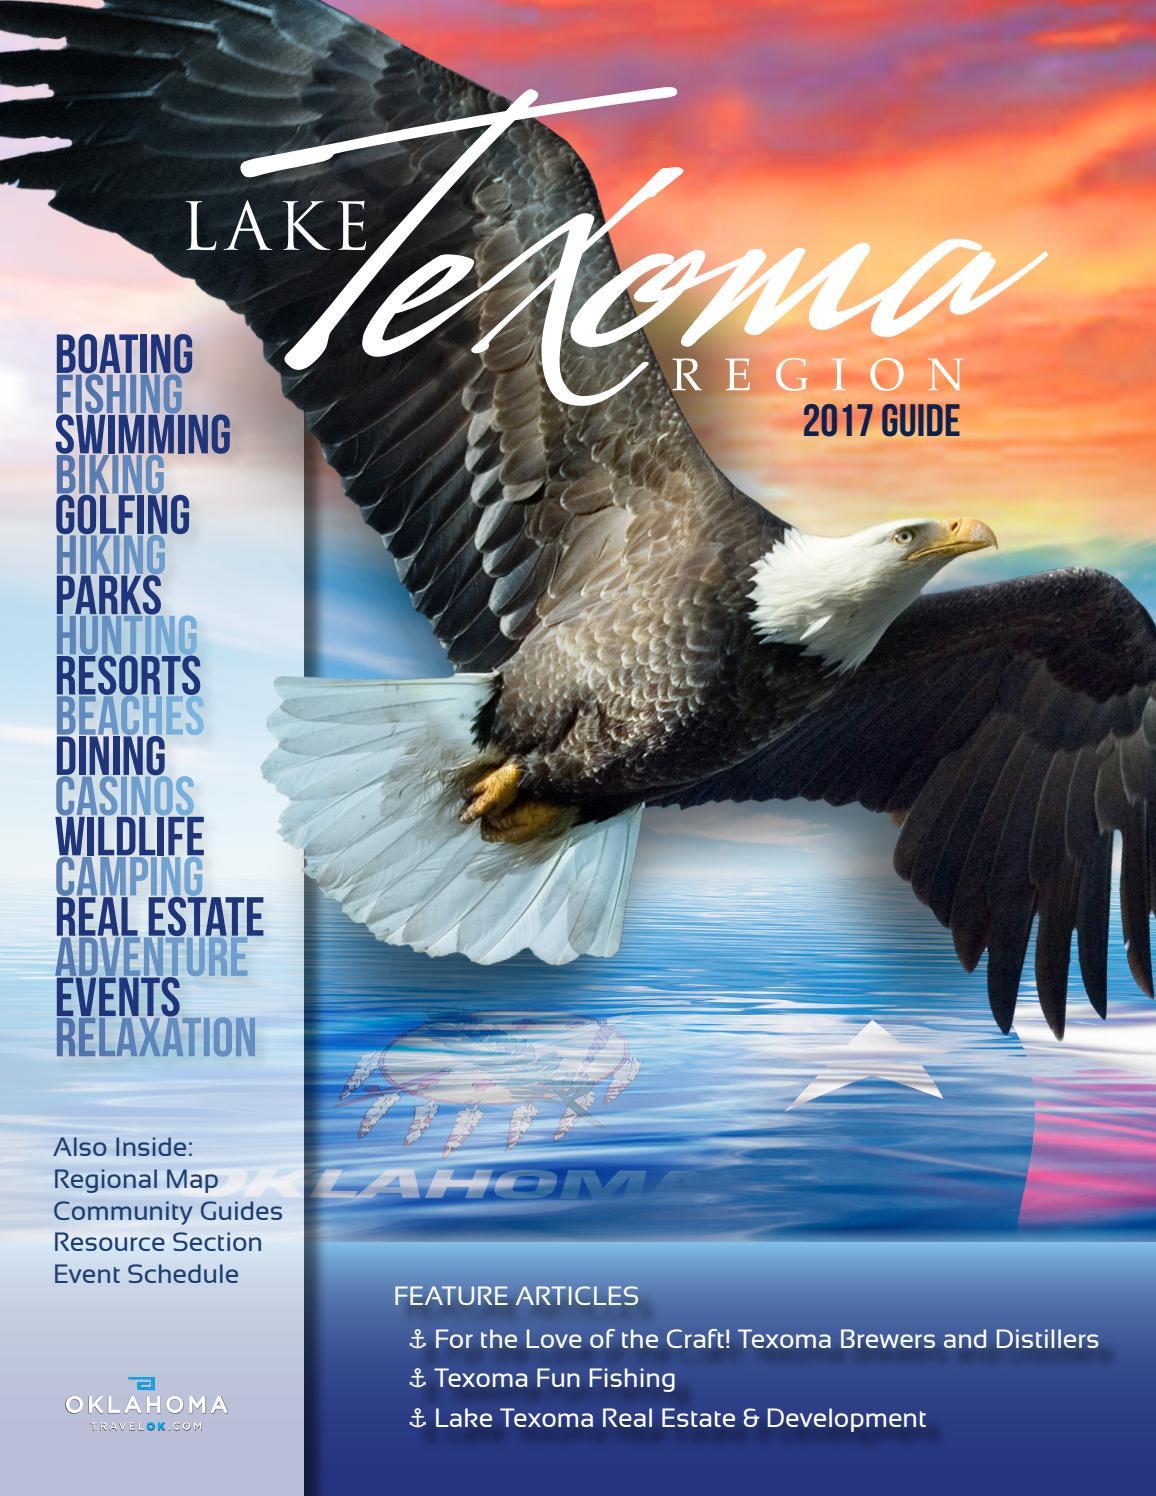 Lake Texoma Association - 2017 Guide by jeannie@moxiegraphex.com - issuu